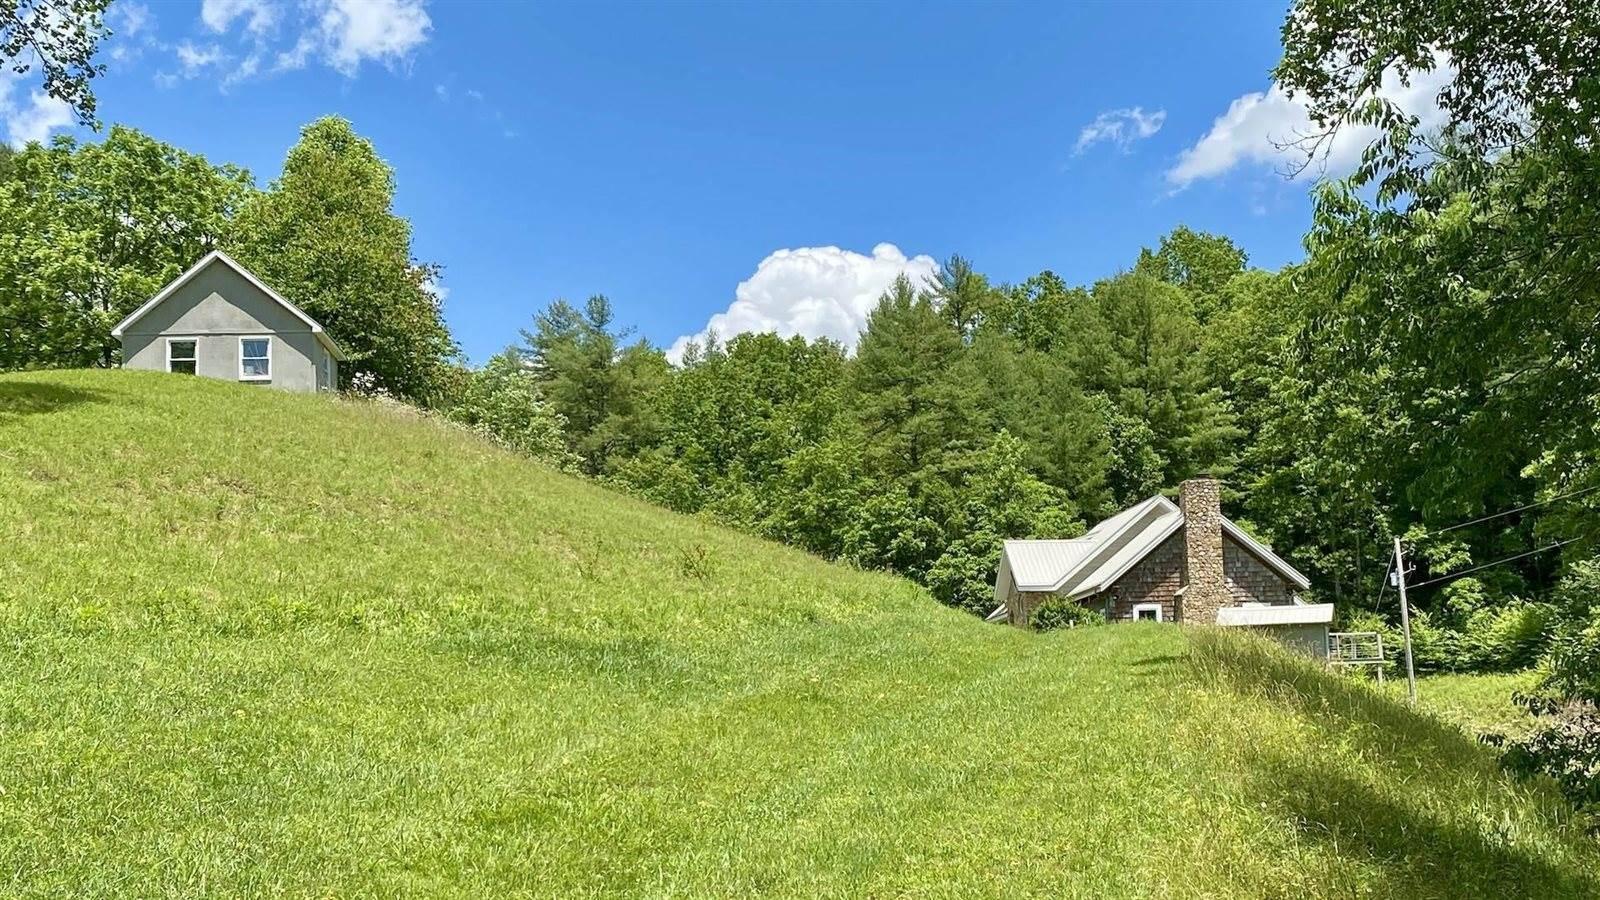 584 Old Wildcat Trail, Hillsville, VA 24343